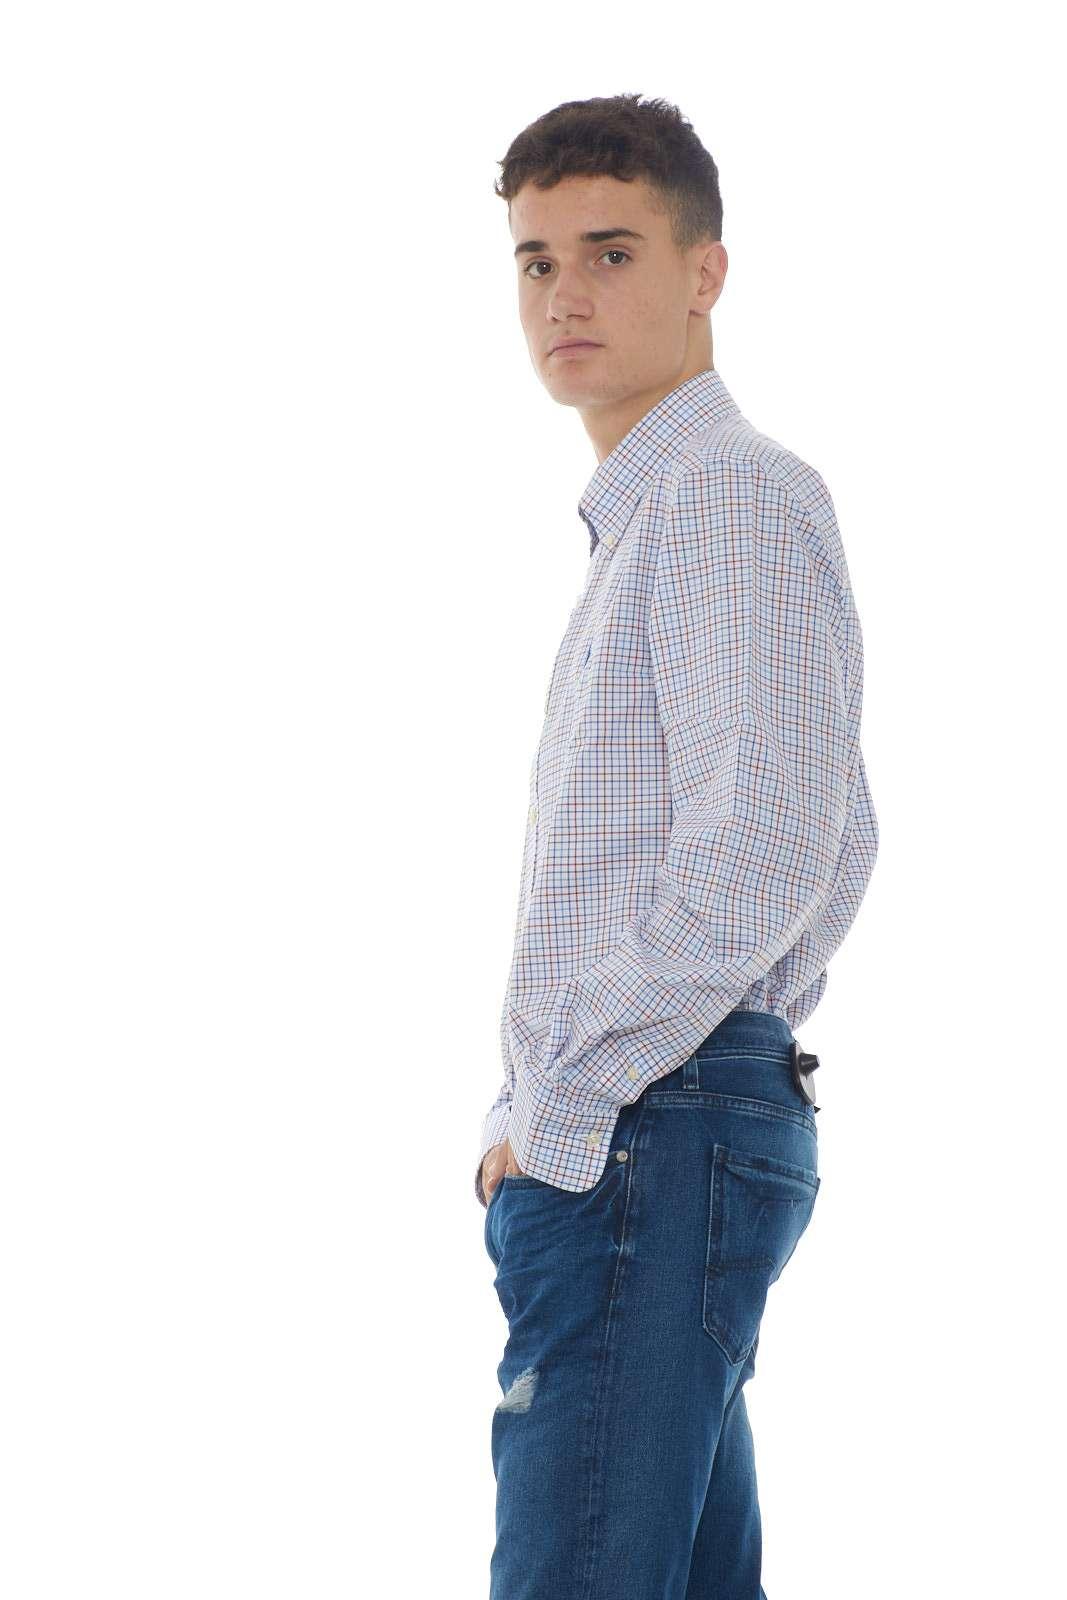 https://www.parmax.com/media/catalog/product/a/i/AI-outlet_parmax-camicia-uomo_Ralph-Lauren-712766318005-B.jpg